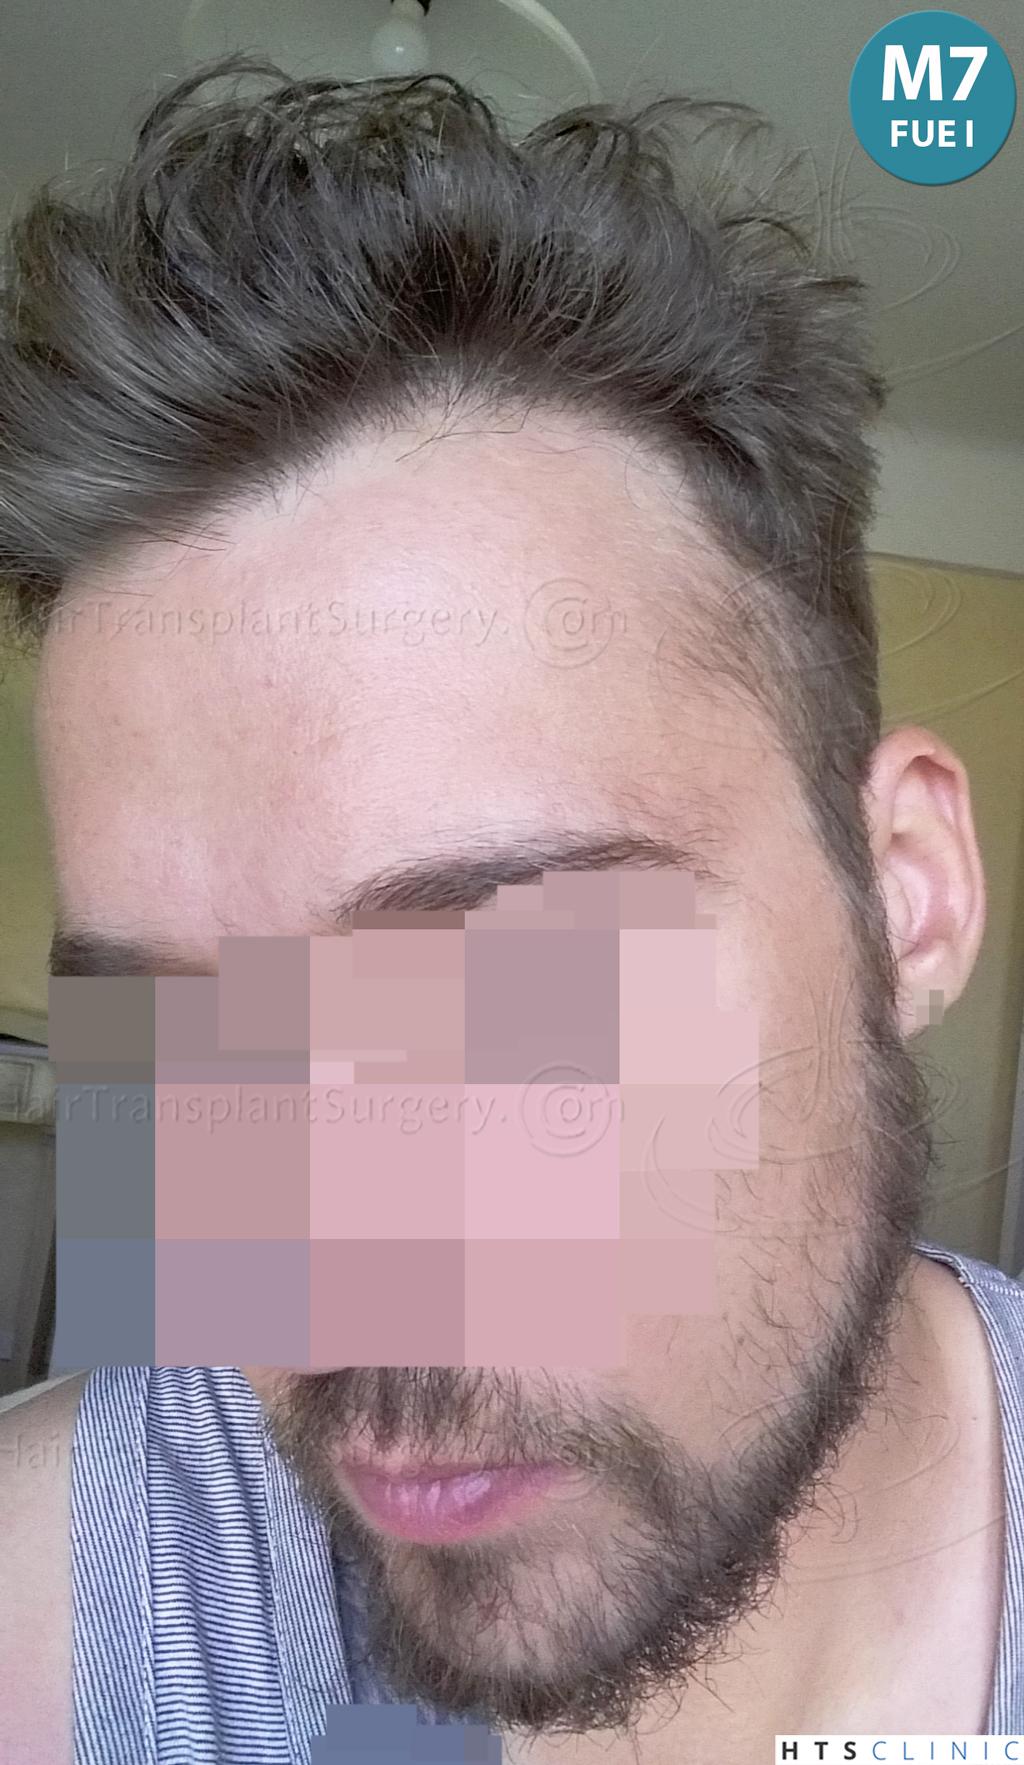 Dr.Devroye-HTS-Clinic-6132-_2011_1232_2889_-FUE-Barbe-et-cheveux-21.jpg